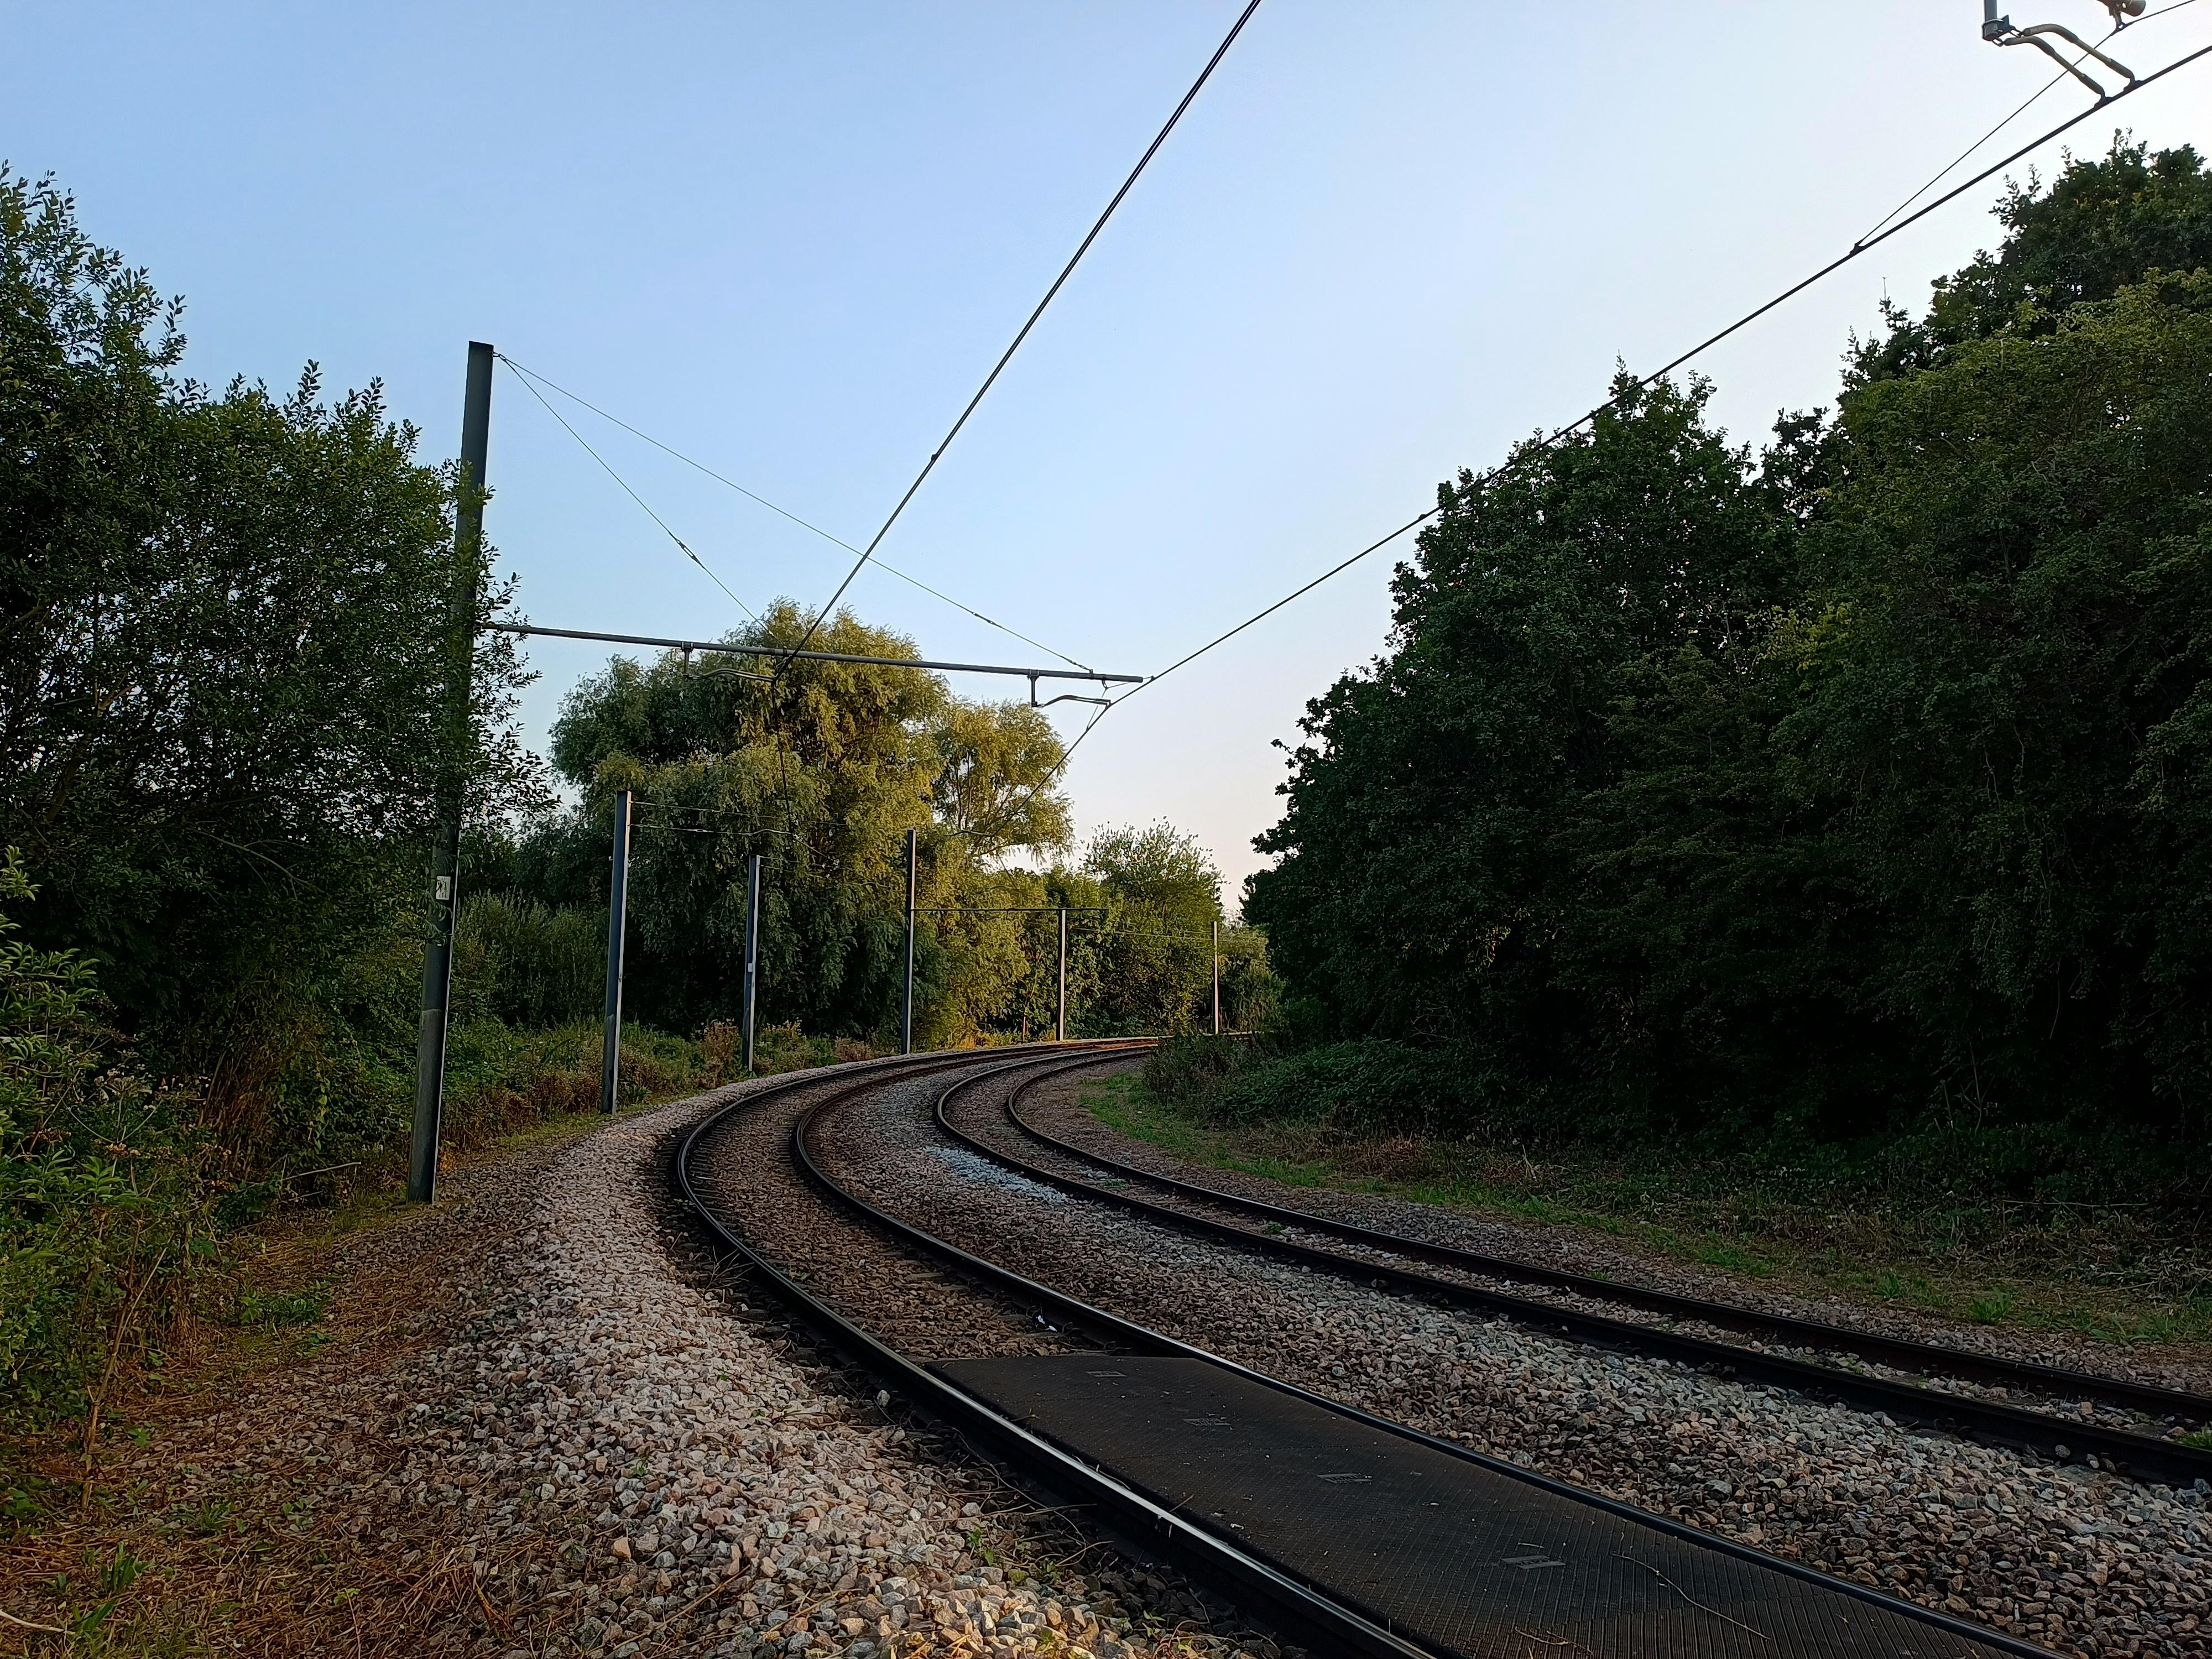 A photo of a railway line taken by the Motorola Edge 20 Lite